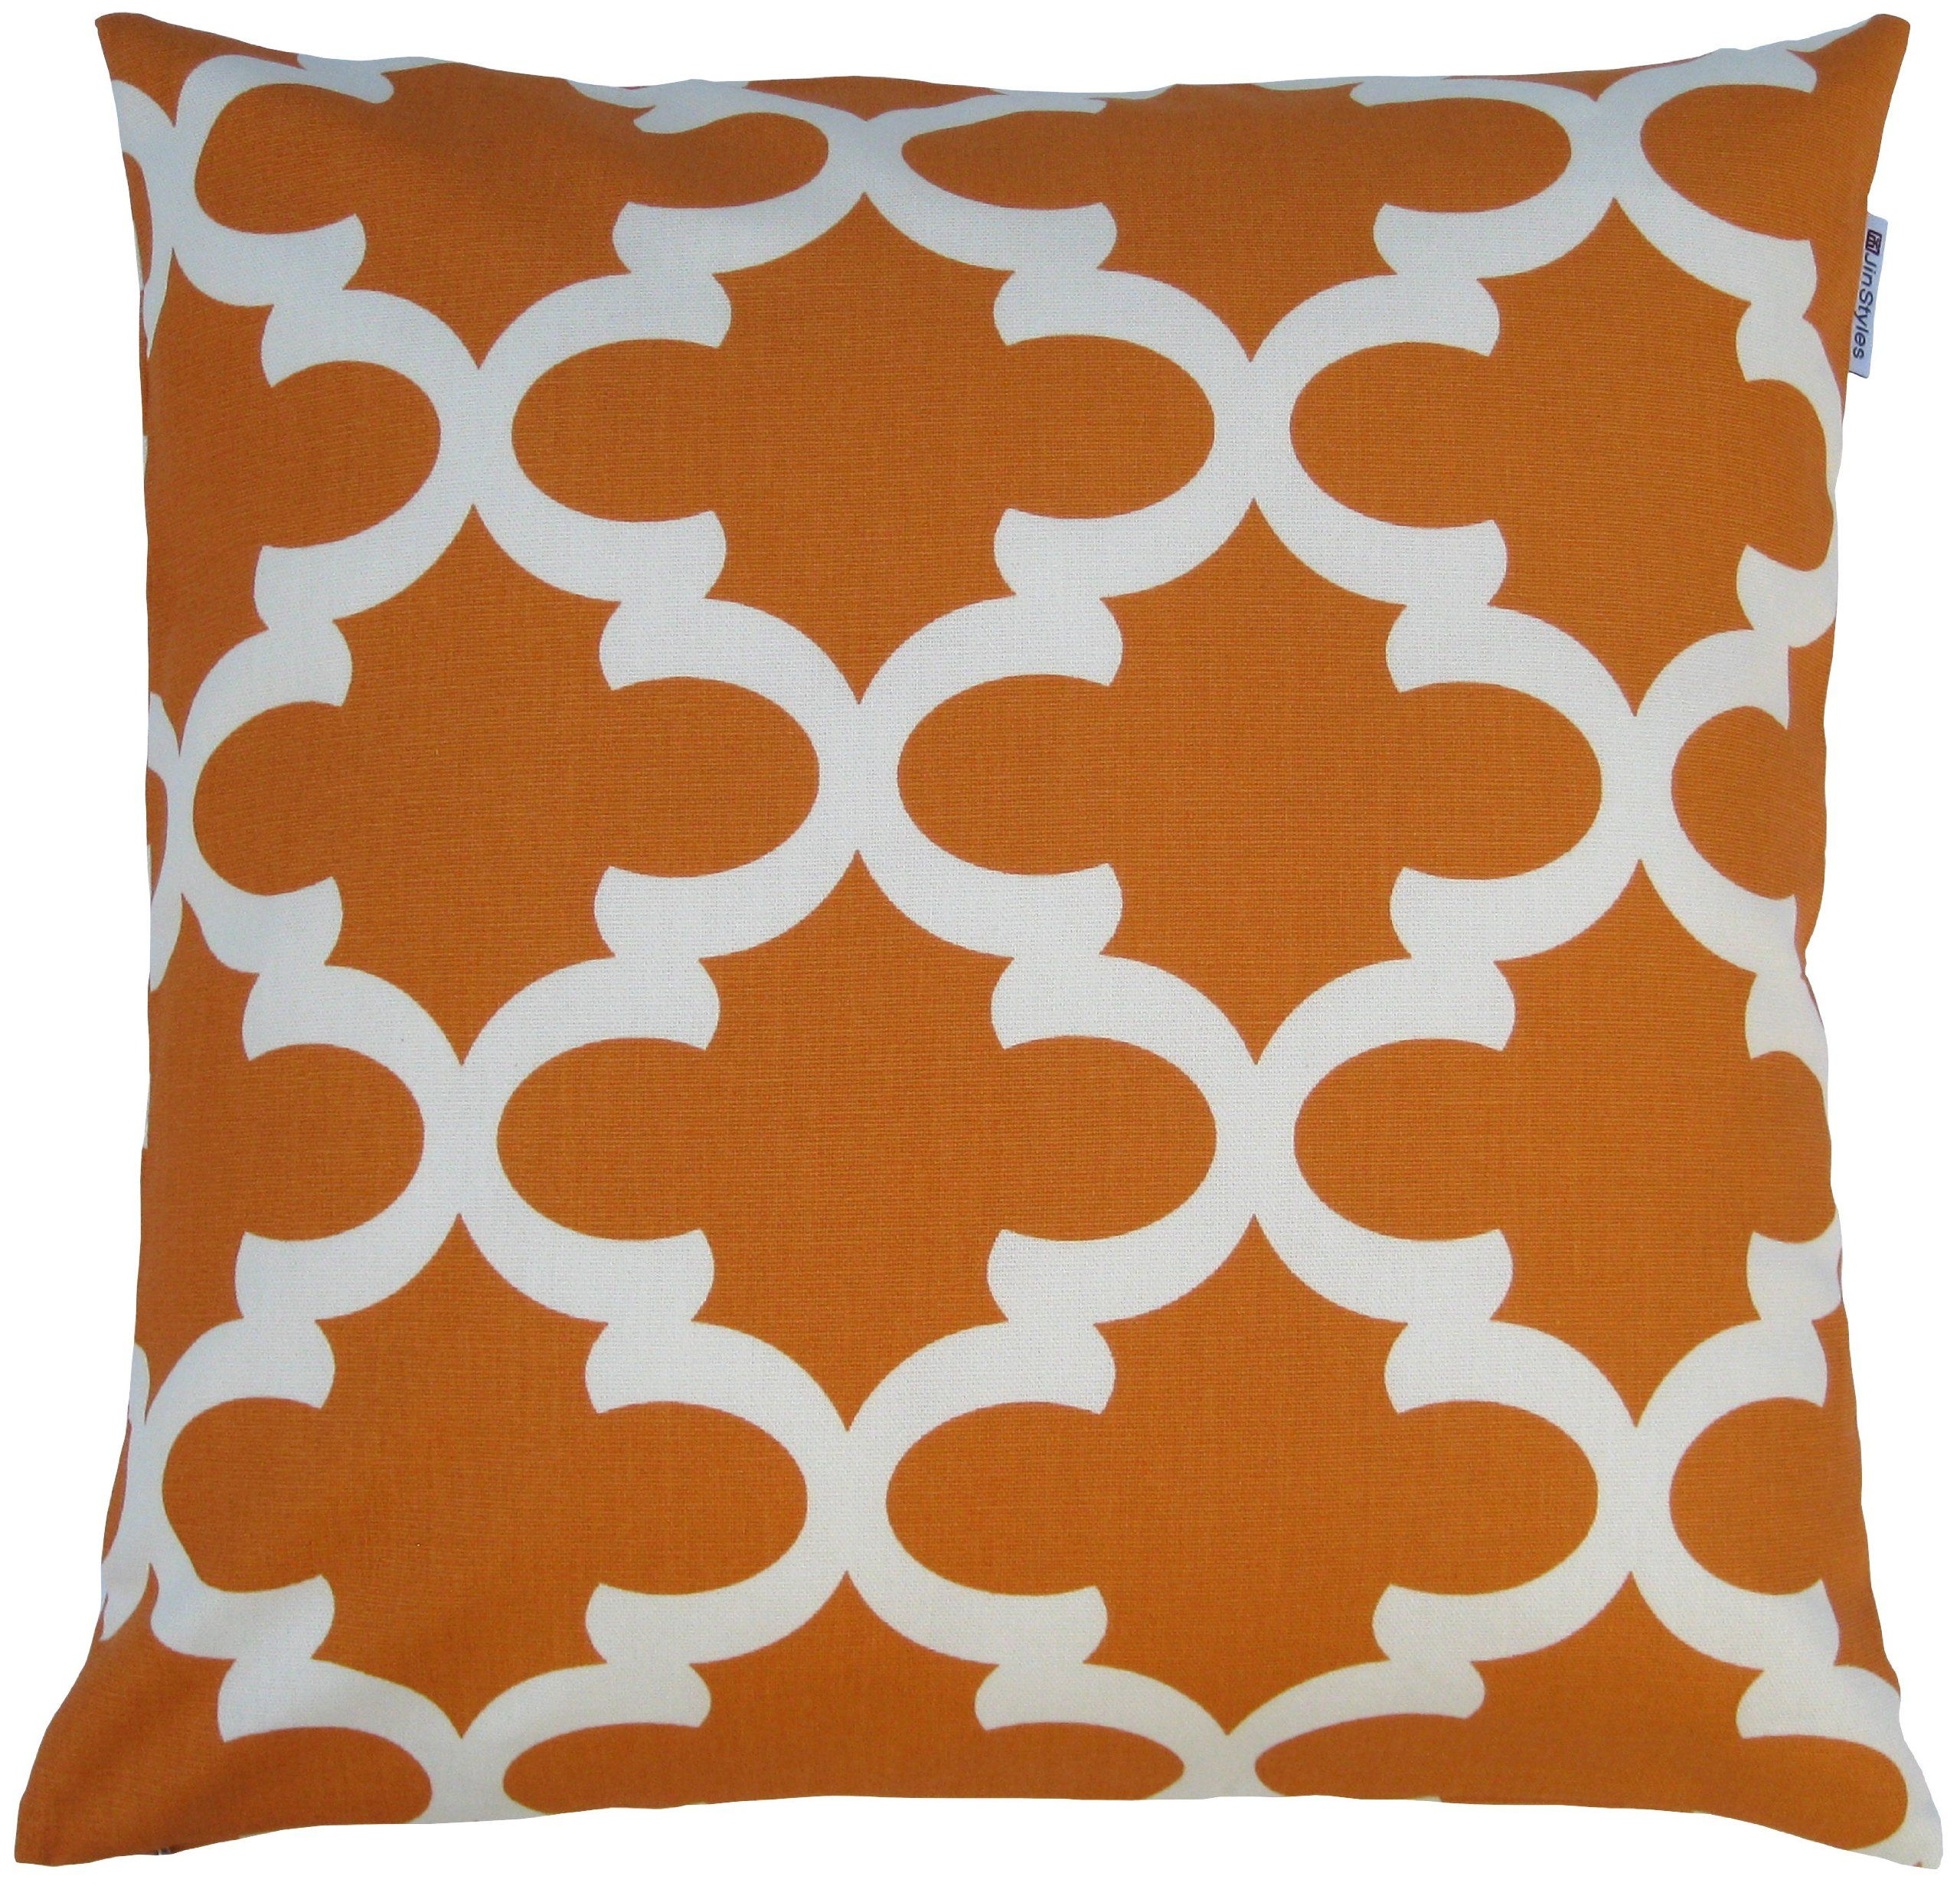 throw best mother pillow bead pillows chocolate silk image child magazine falls home ideas sparkle alt sd pop orange app reversible sioux red